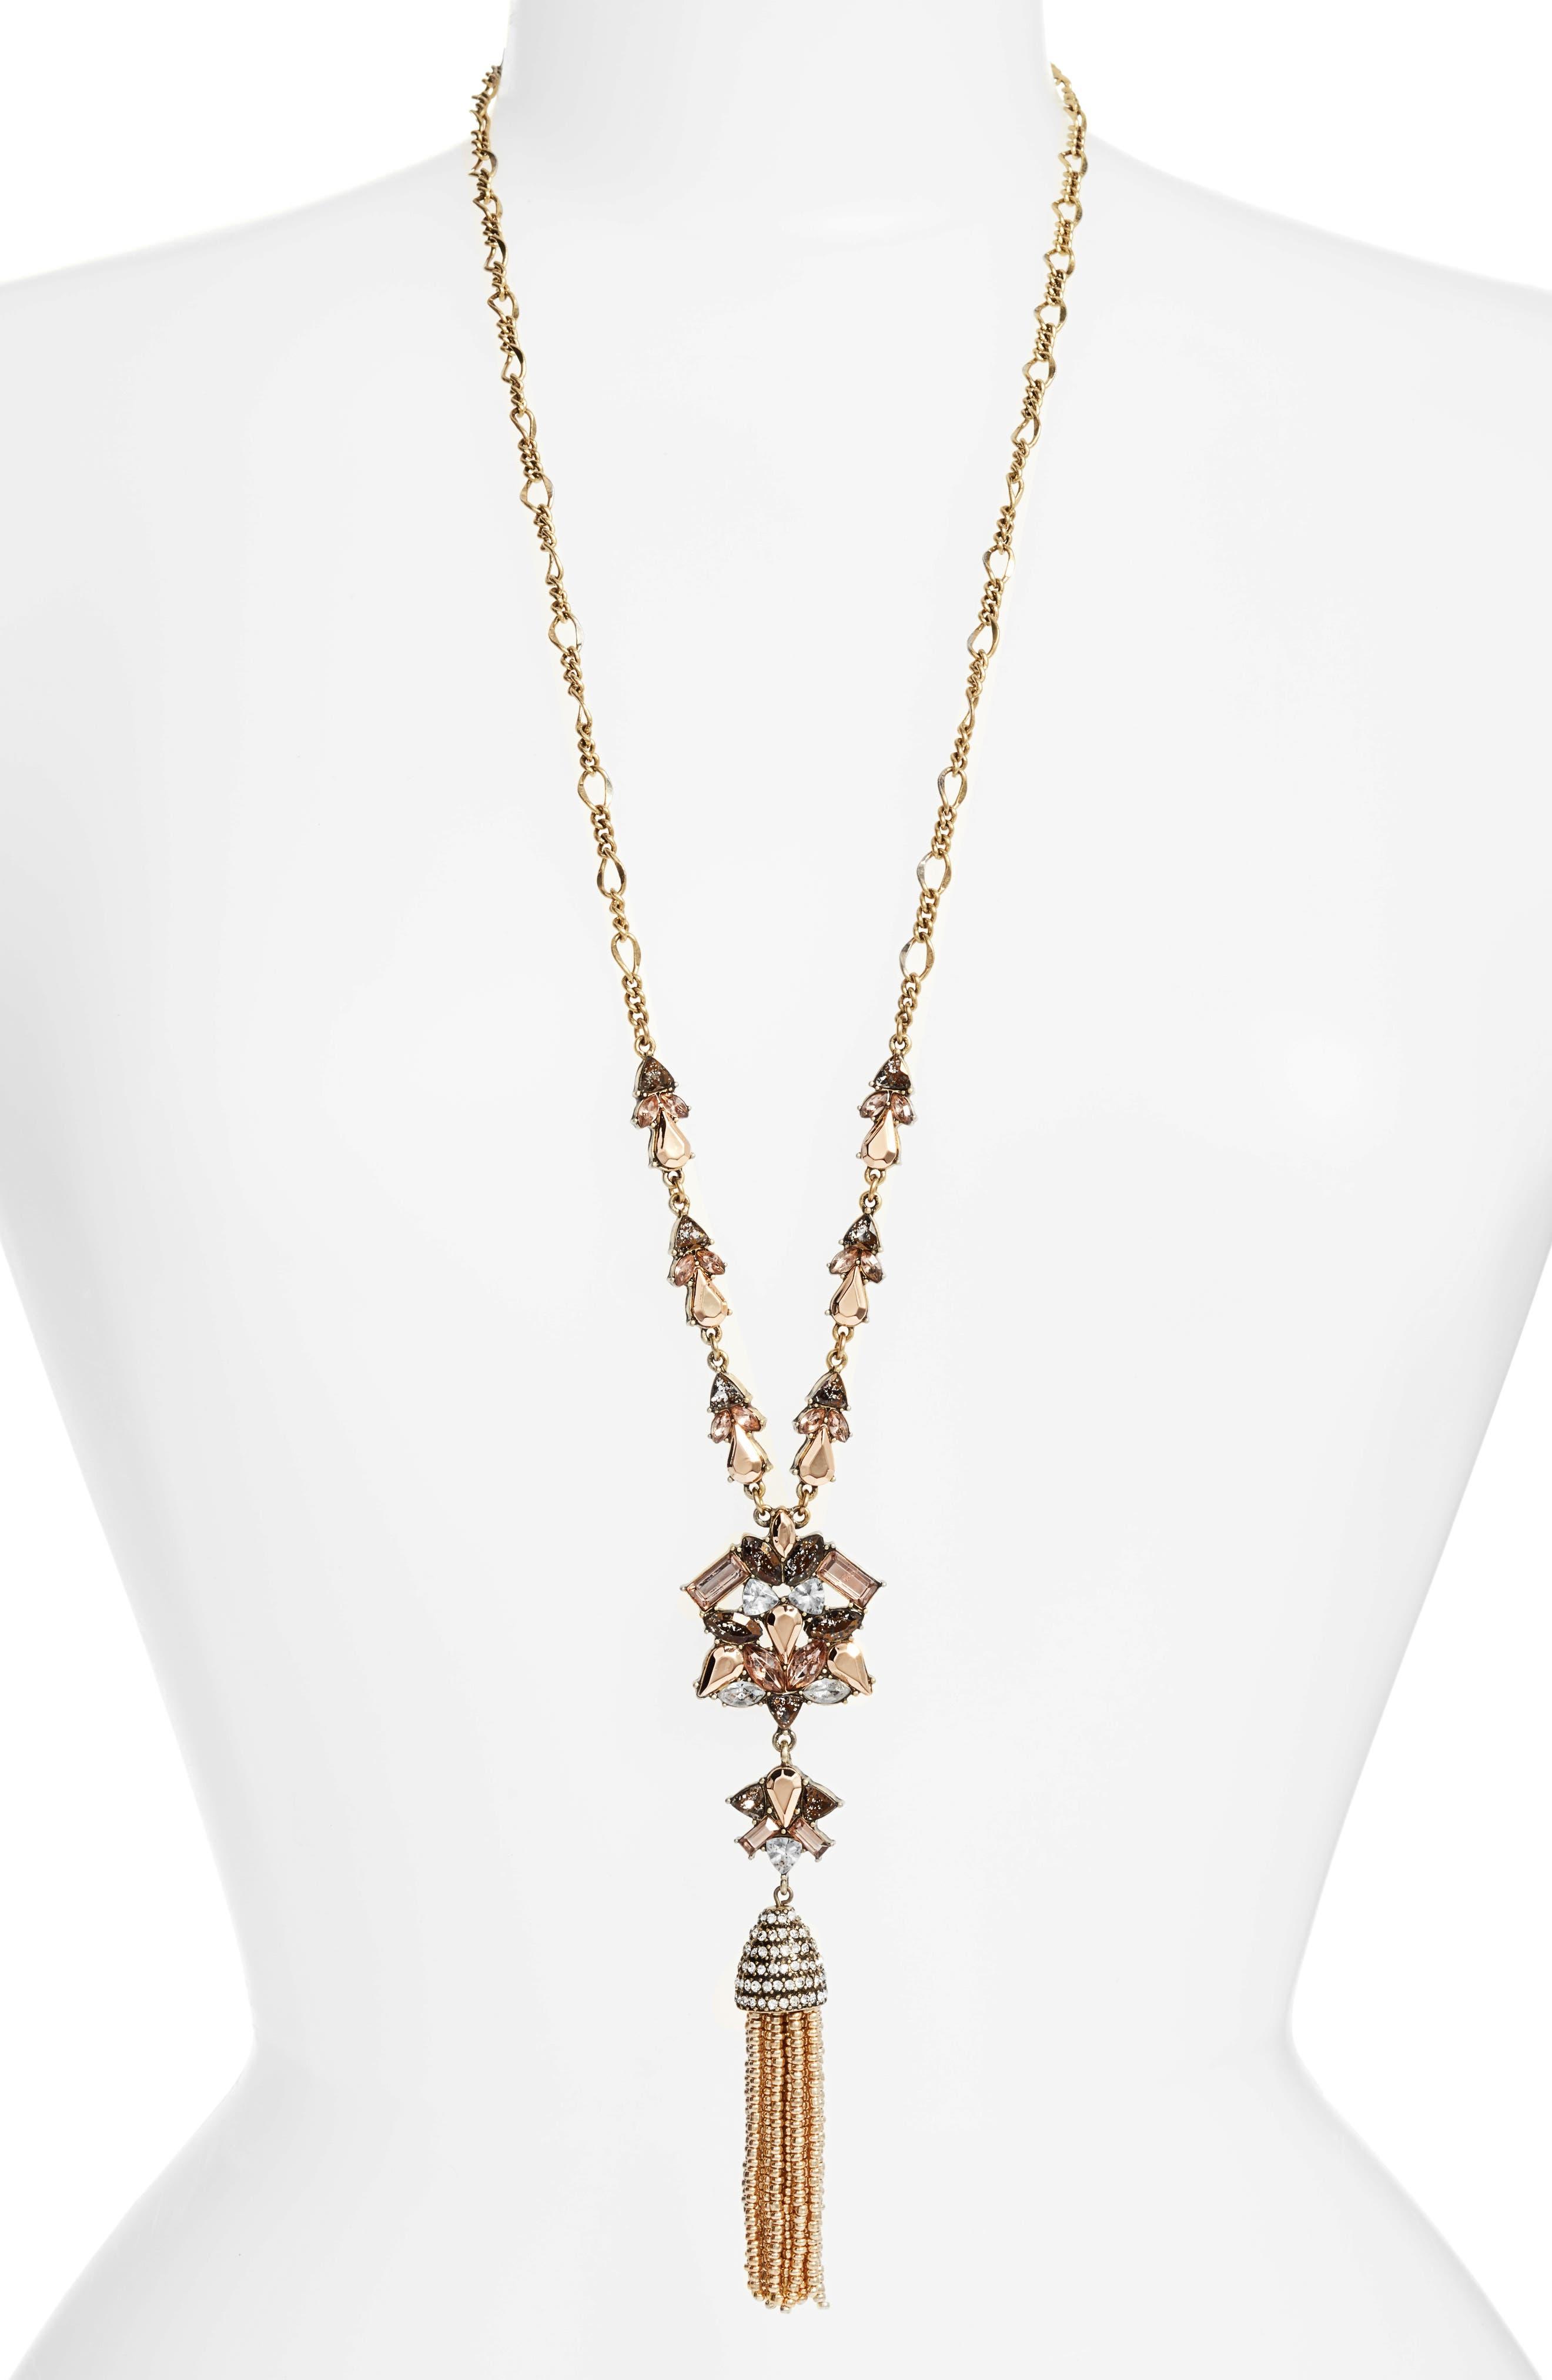 Main Image - Baublebar Cosma Tassel Pendant Necklace